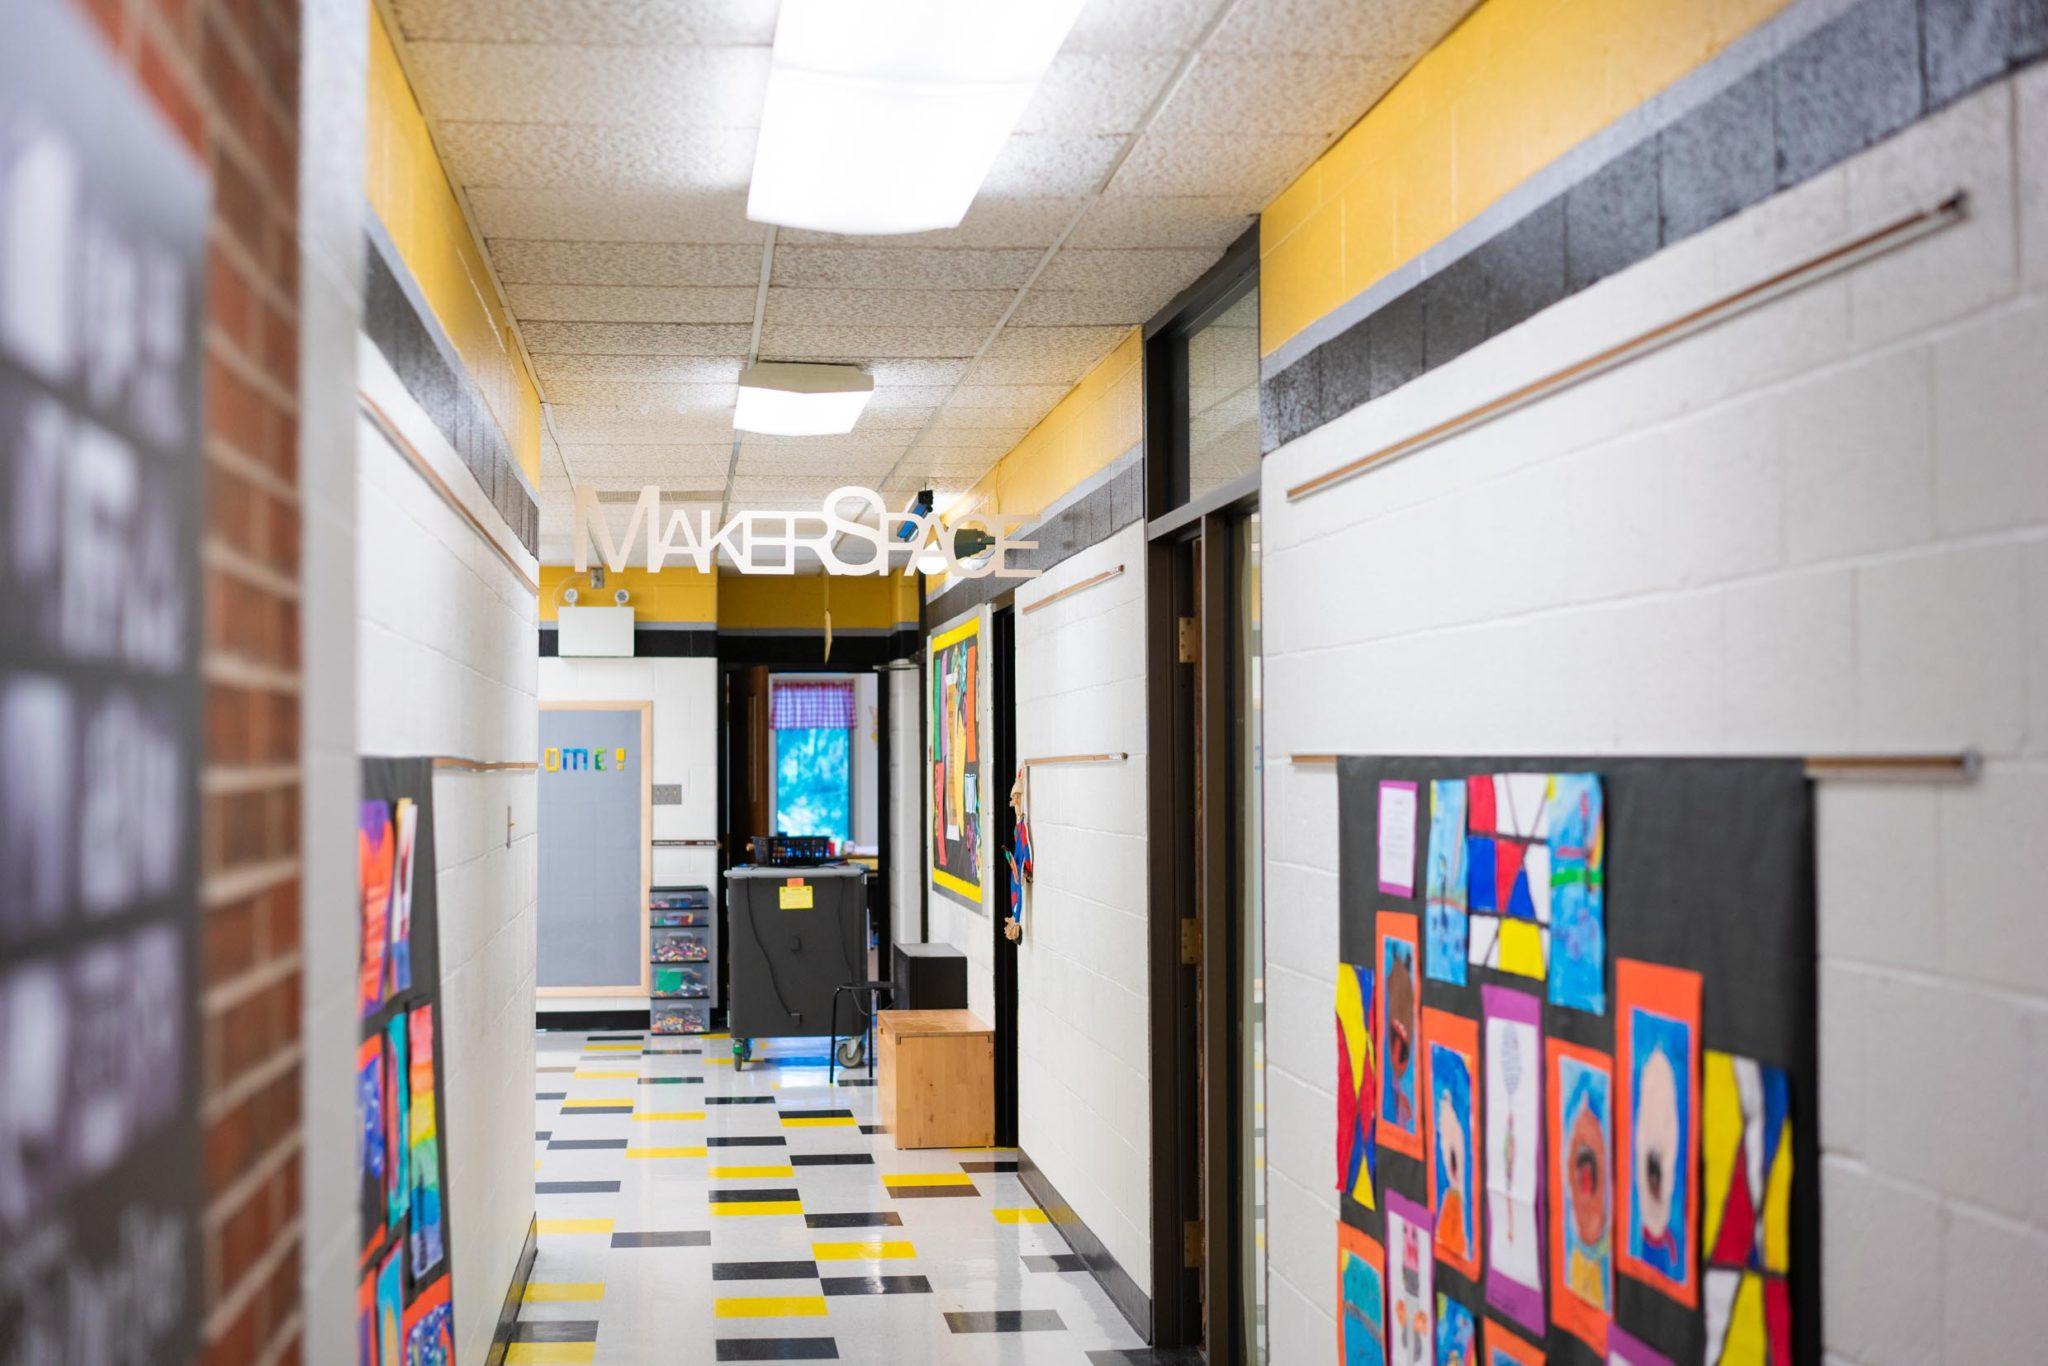 hallway of elementary school